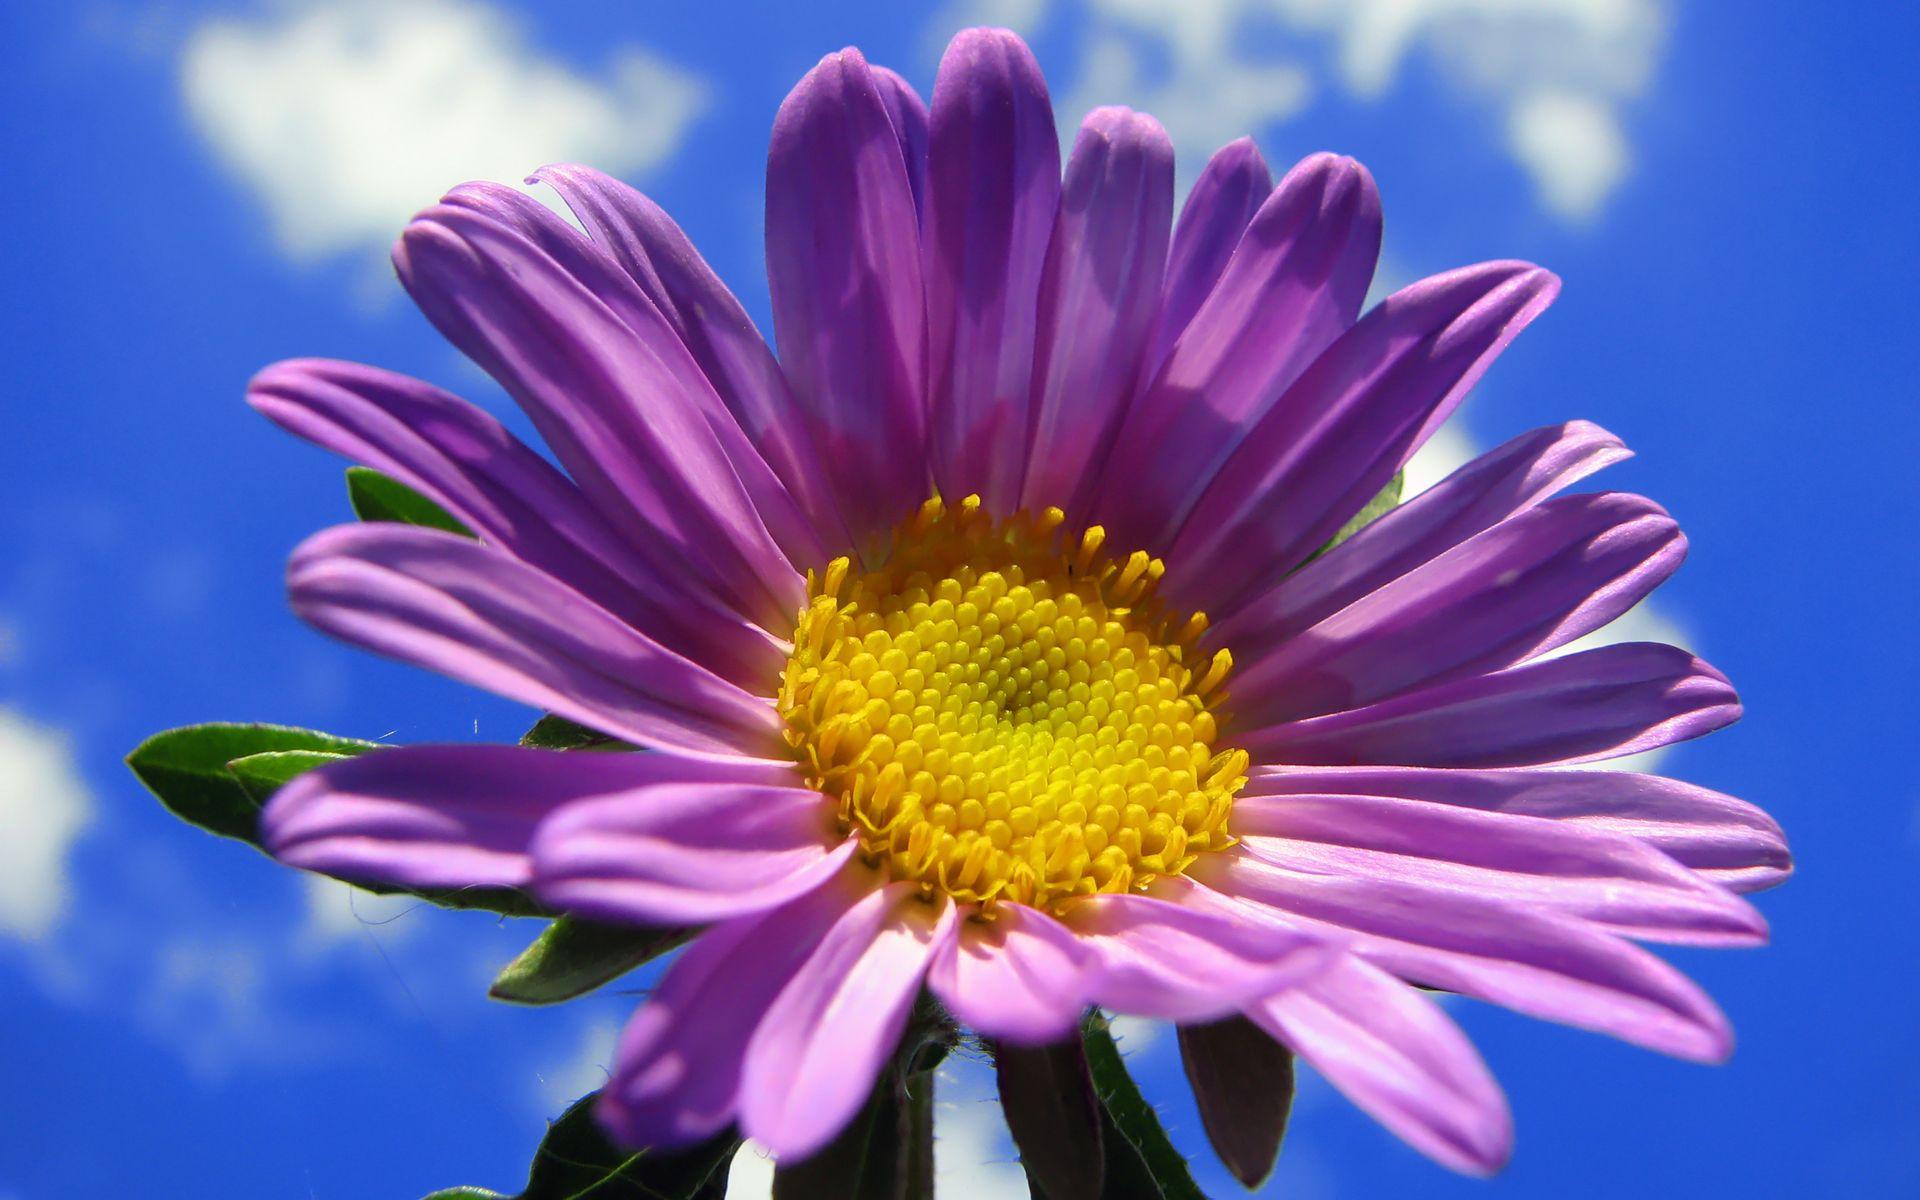 Wallpapers flower http69hdwallpaperswallpapers flower wallpapers flower http69hdwallpaperswallpapers flower beautiful mightylinksfo